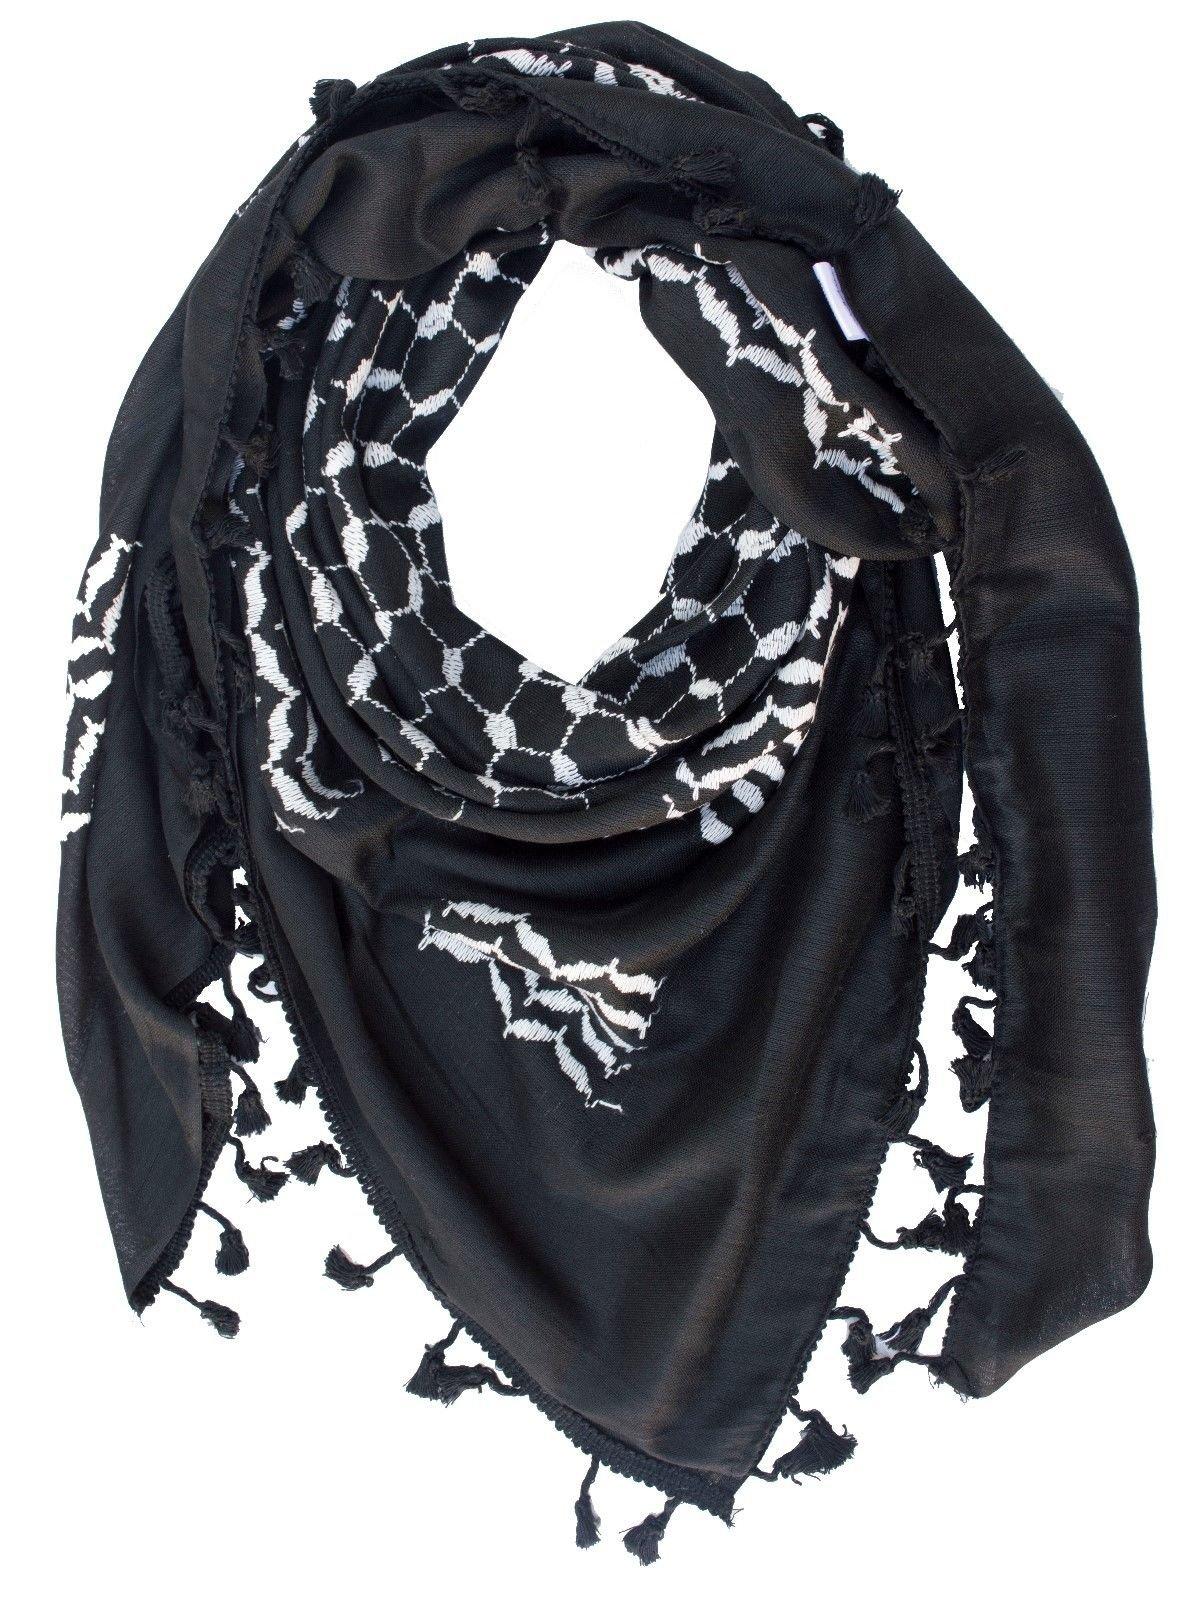 Hirbawi Premium Arabic Scarf 100% Cotton Shemagh Keffiyeh 47''x47'' Arab Scarf (White on Black)